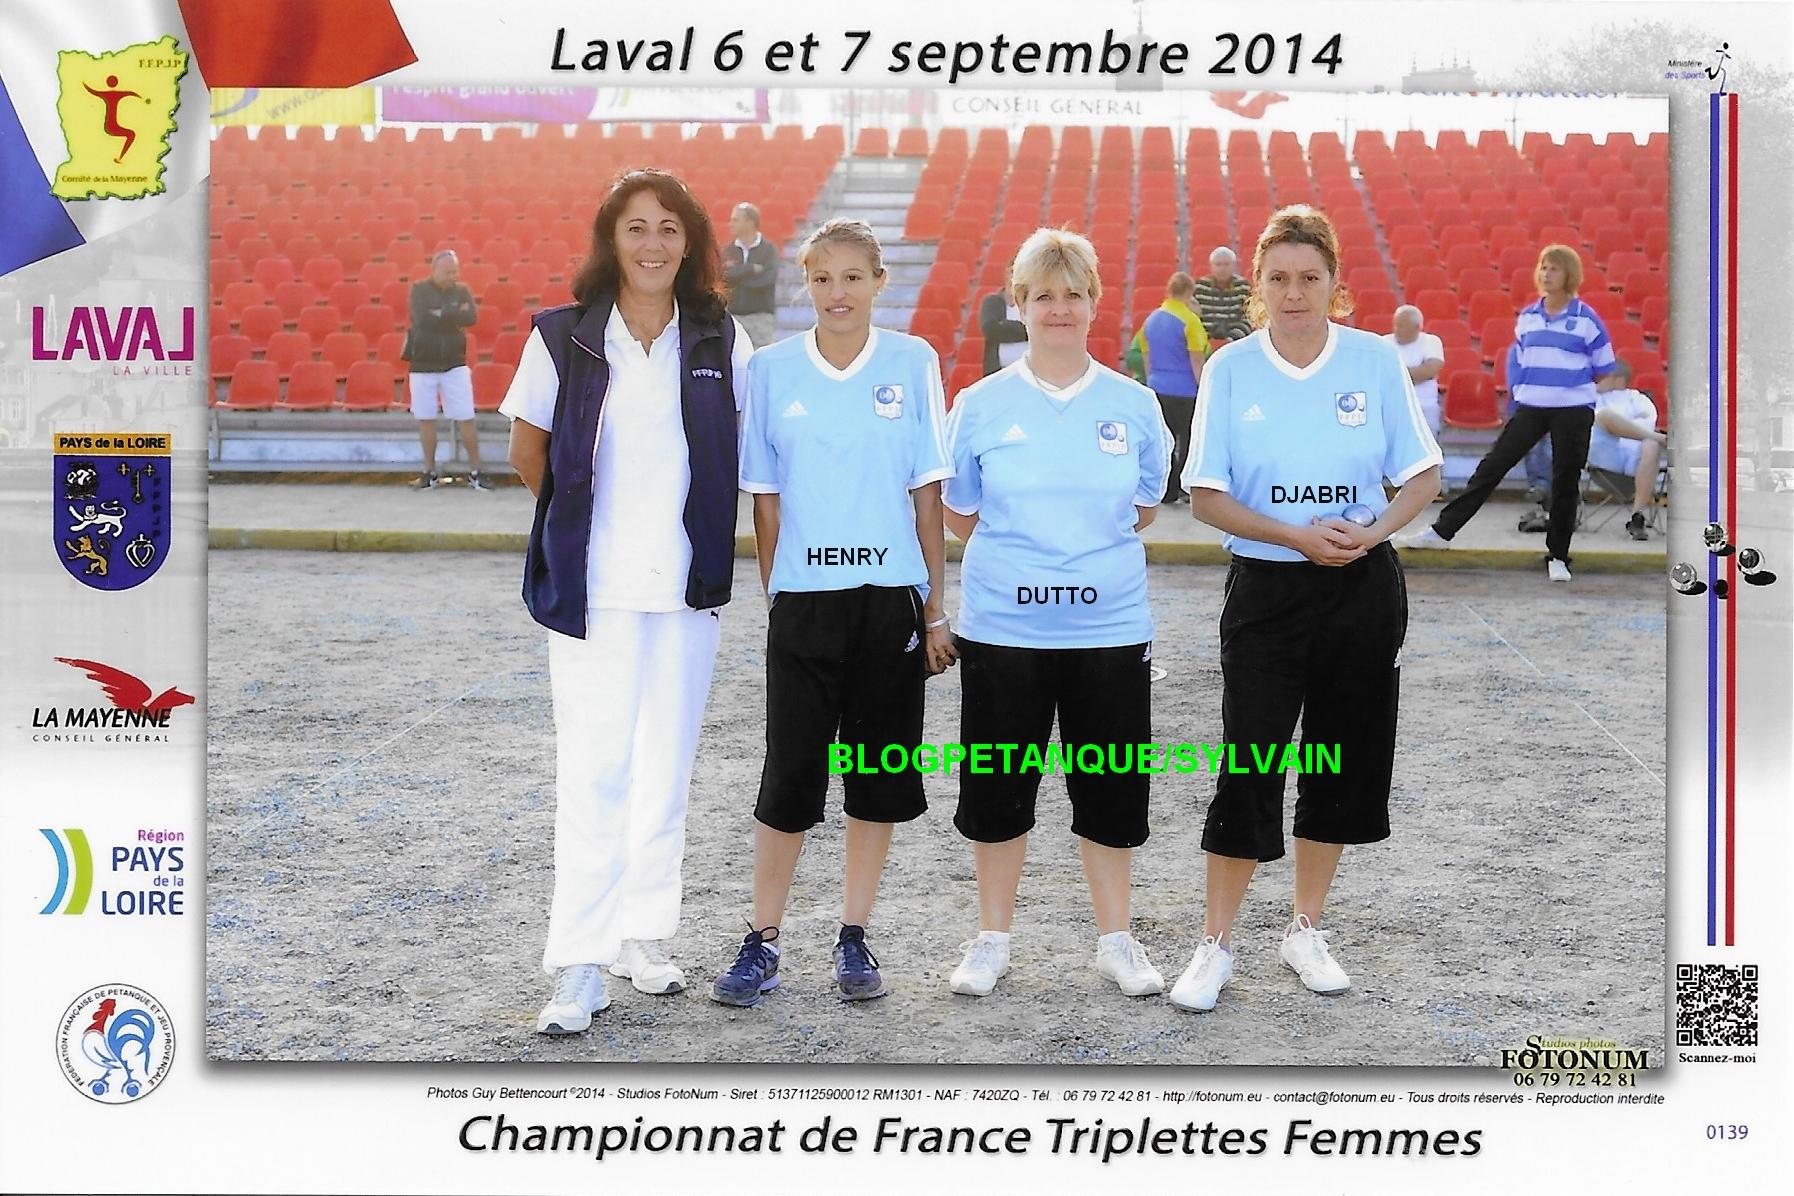 Les champions minimes du 06